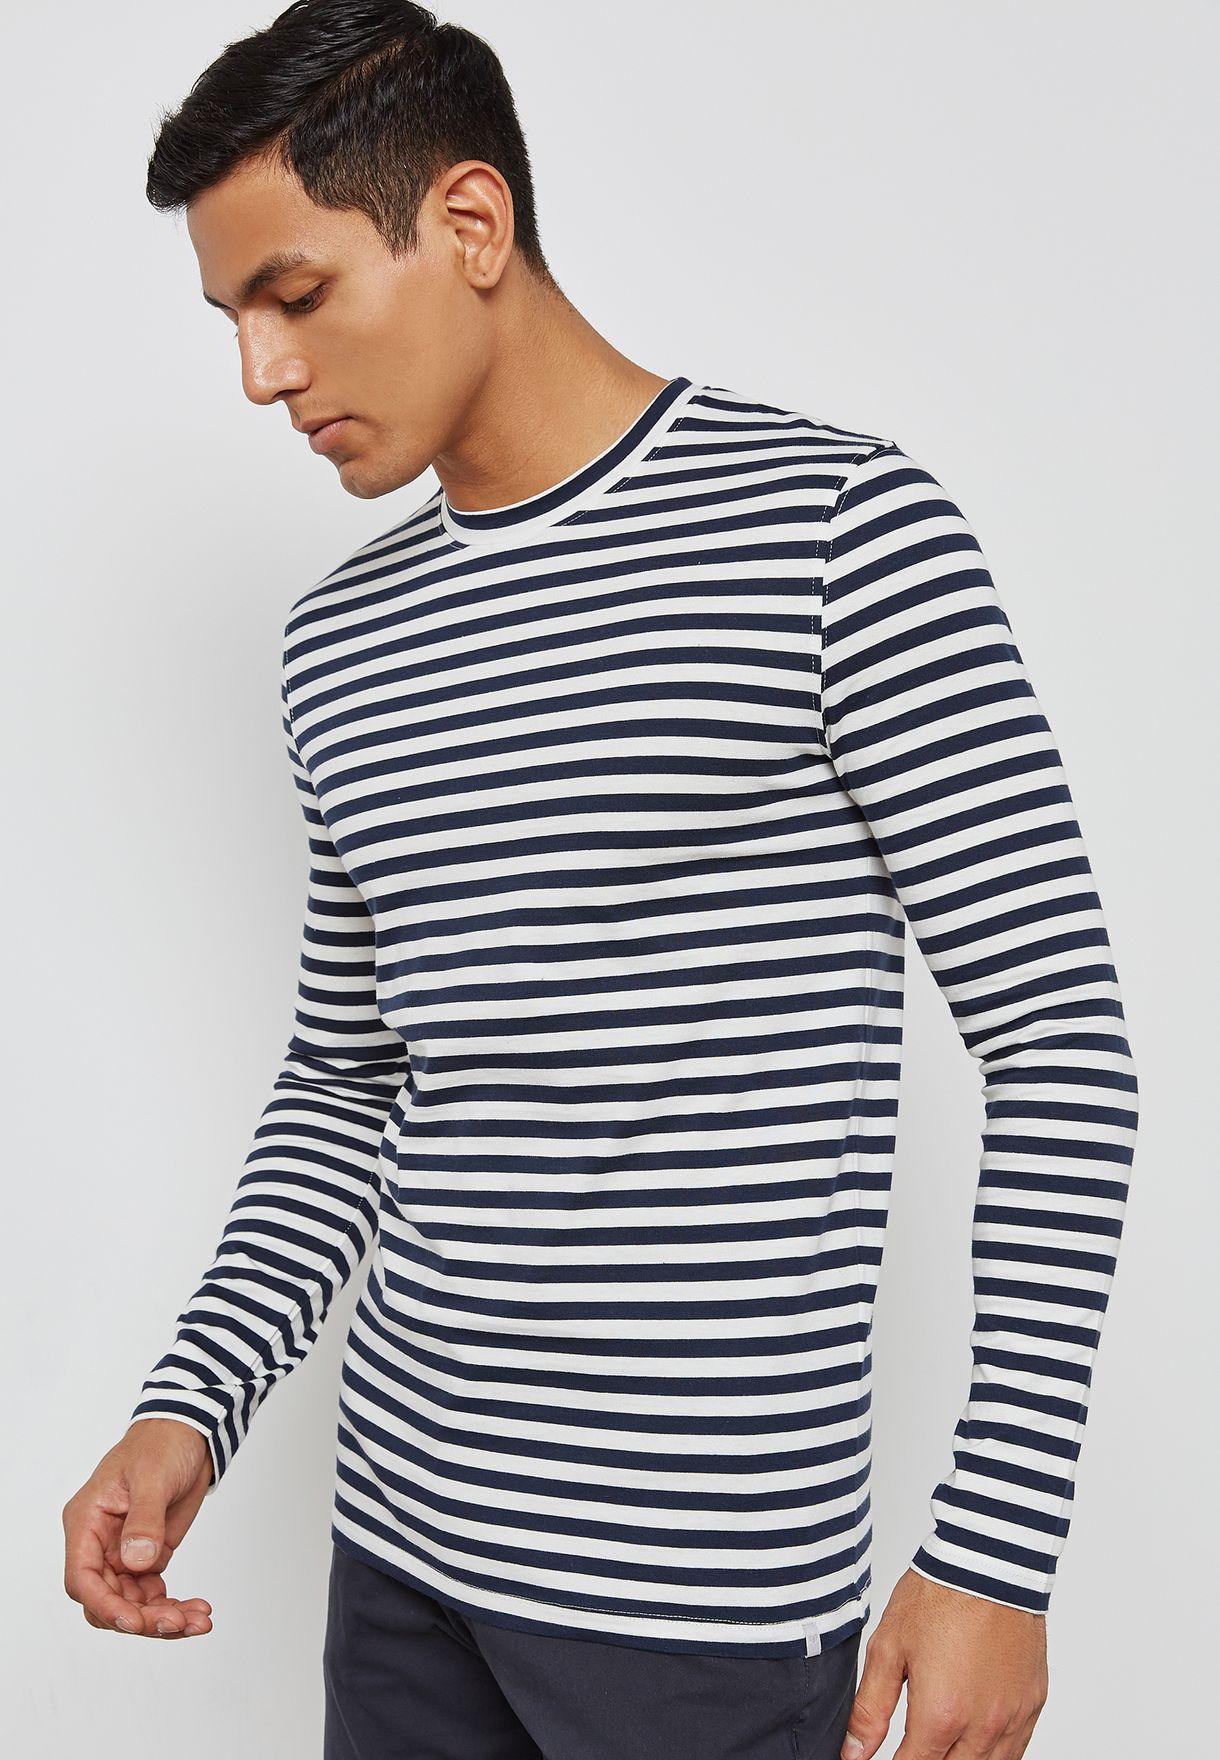 North Striped T-Shirt